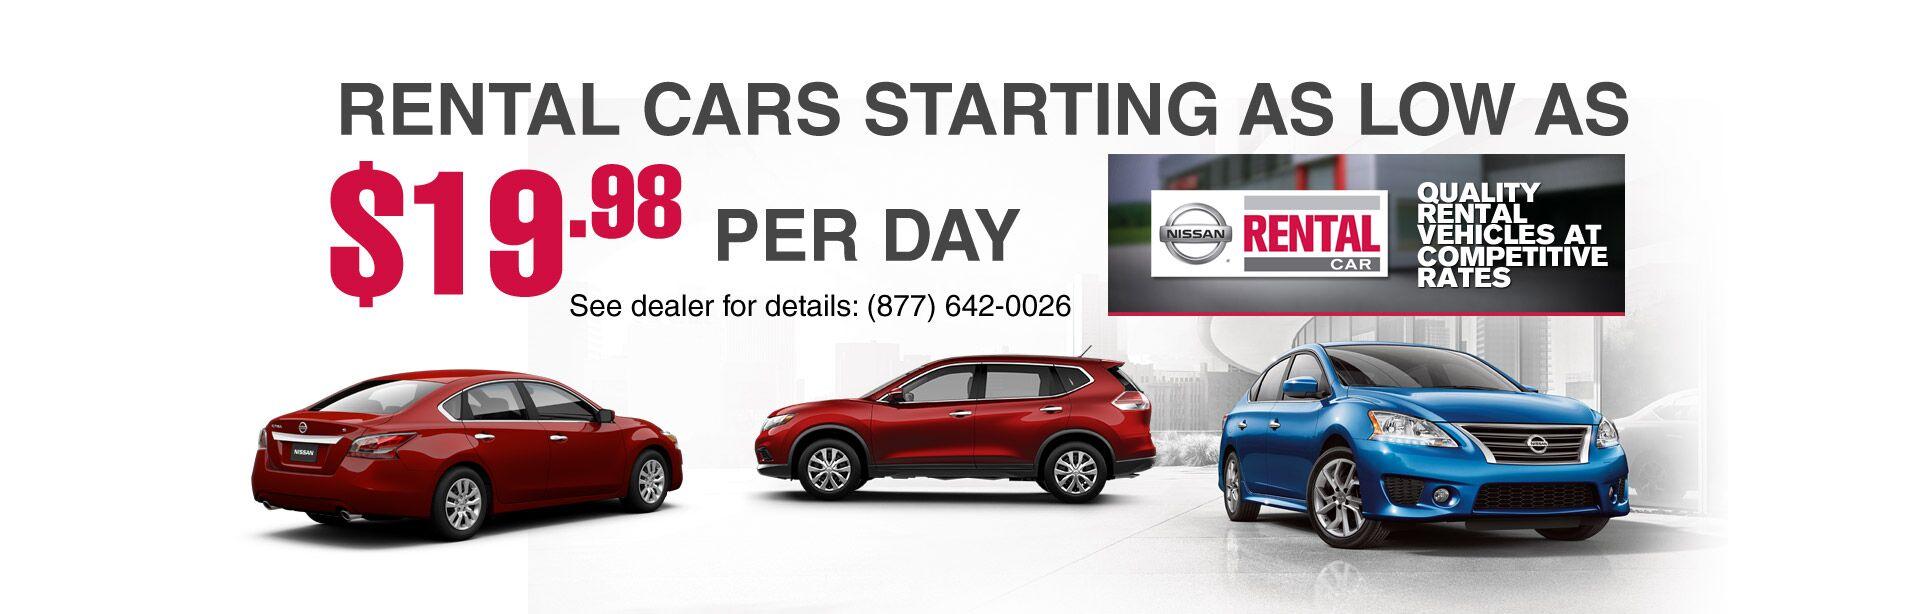 Rental Cars Fairfax Virginia